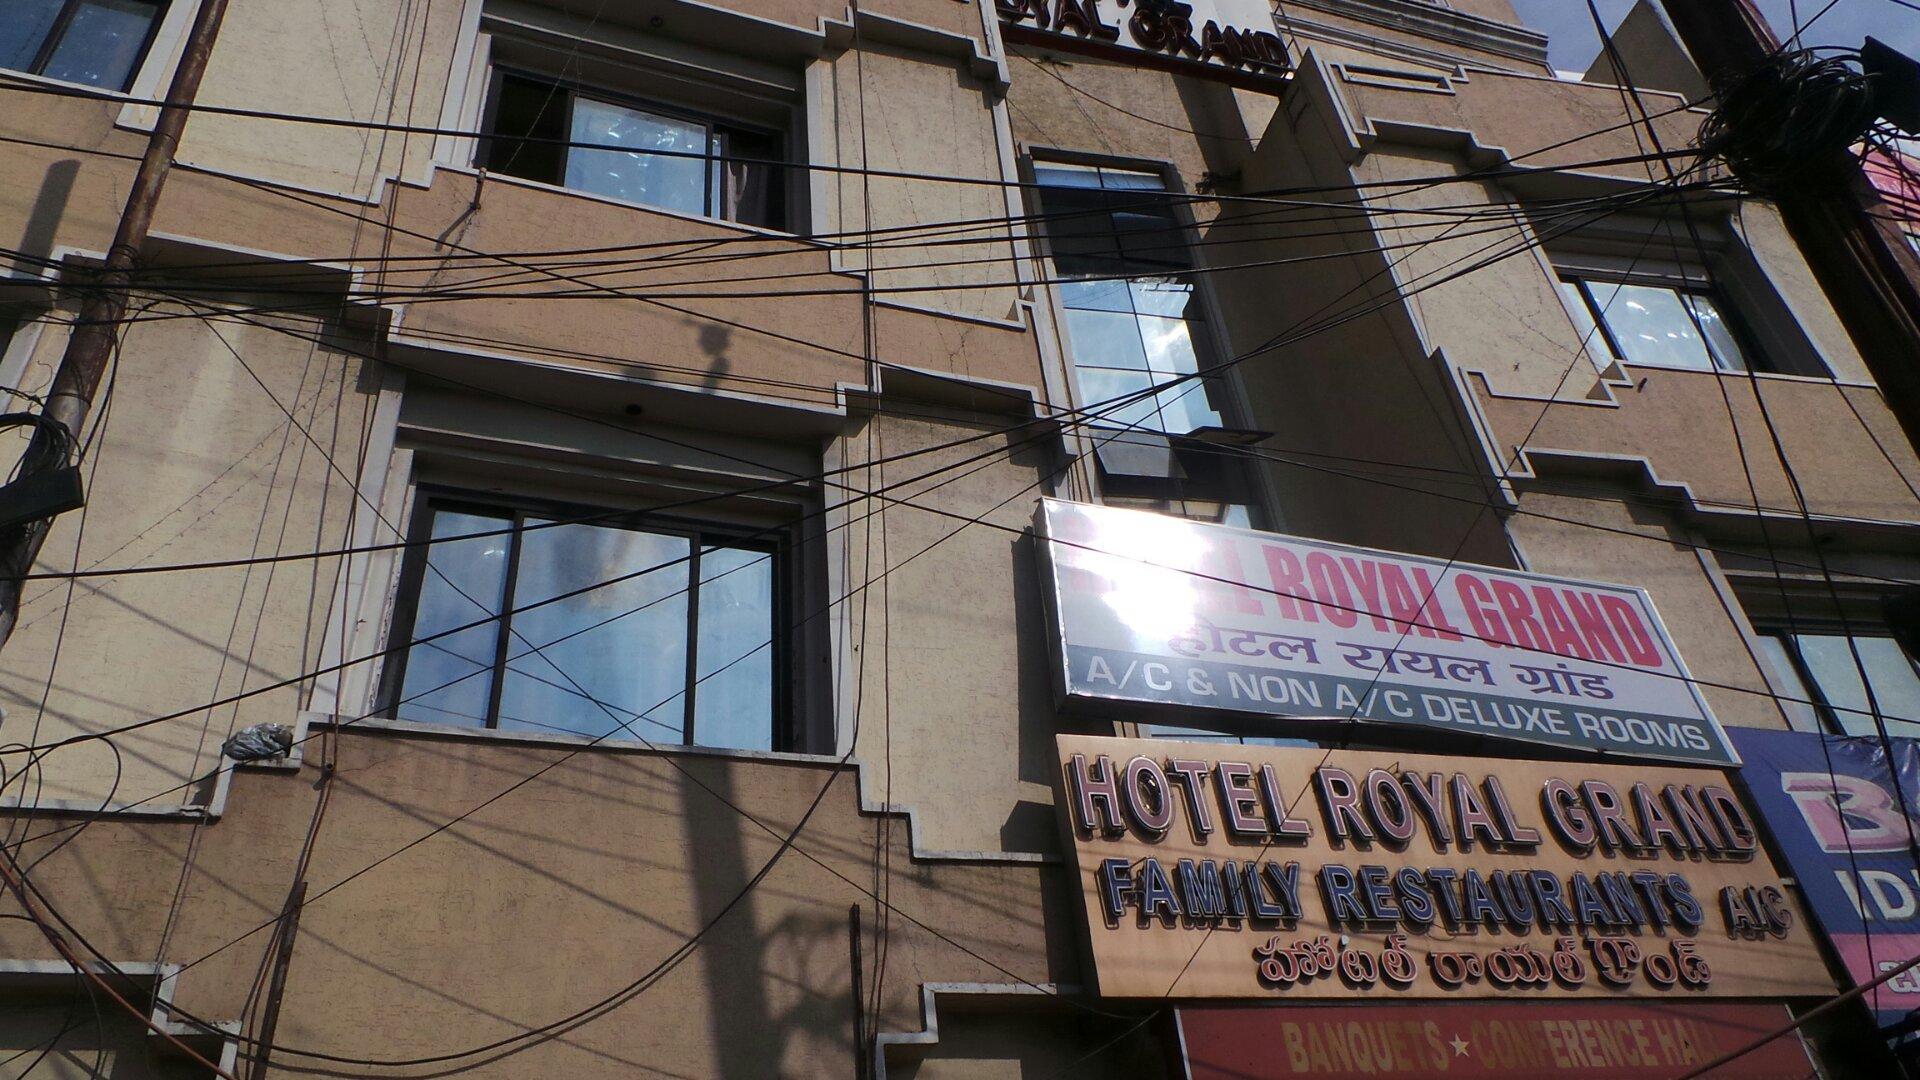 Hotel Royal Grand in Hyderabad